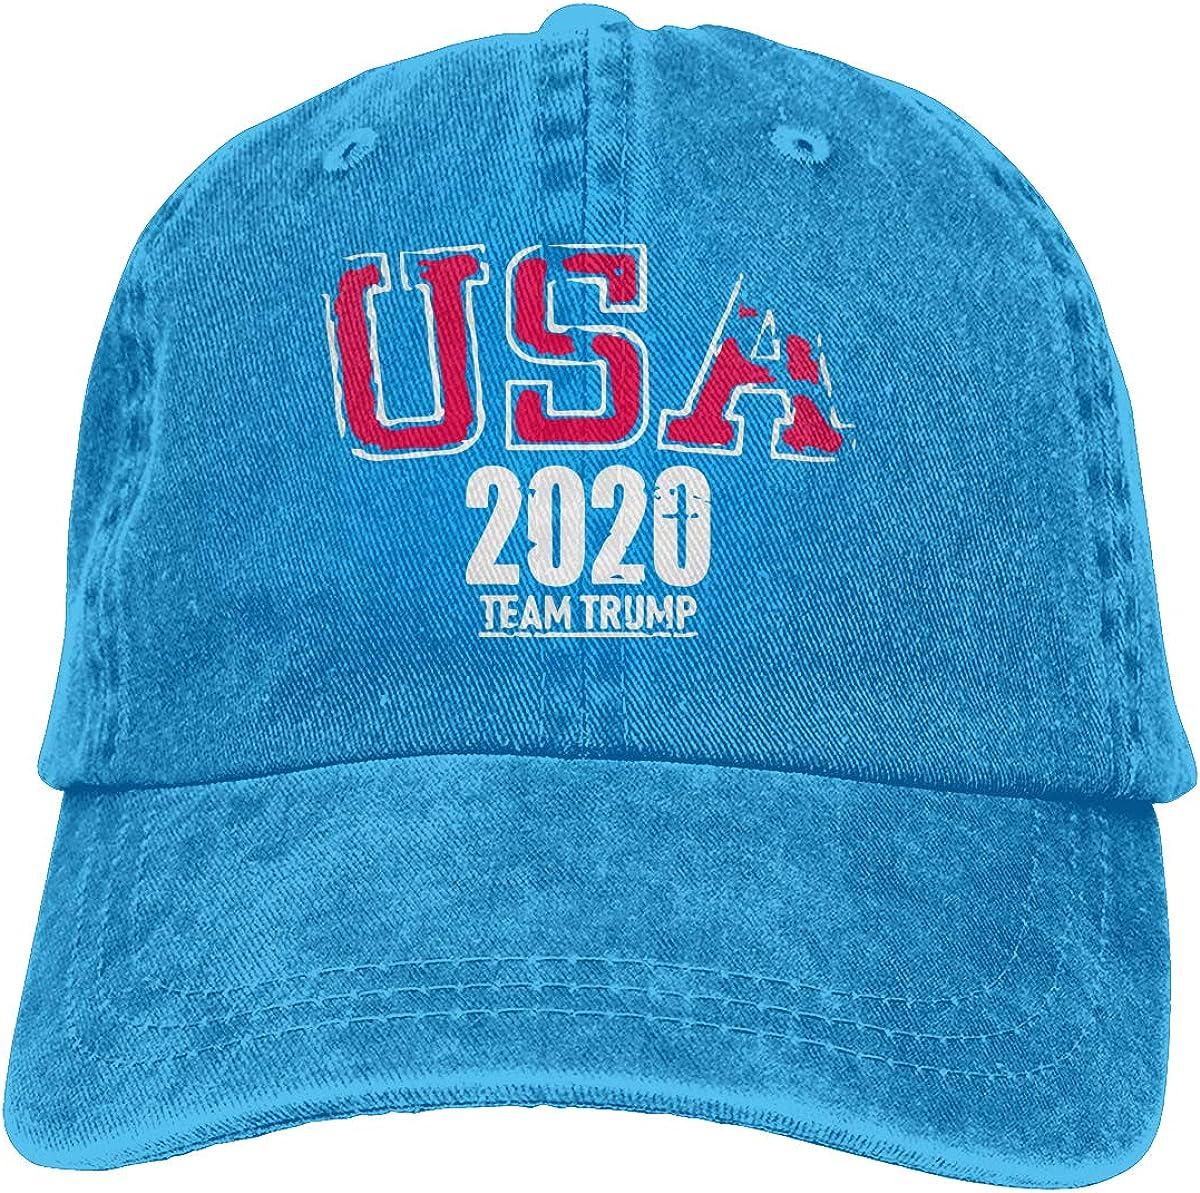 TBVS 77 Men Women Adjustable Denim Fabric Baseball Cap USA 2020 Team Trump Headwear